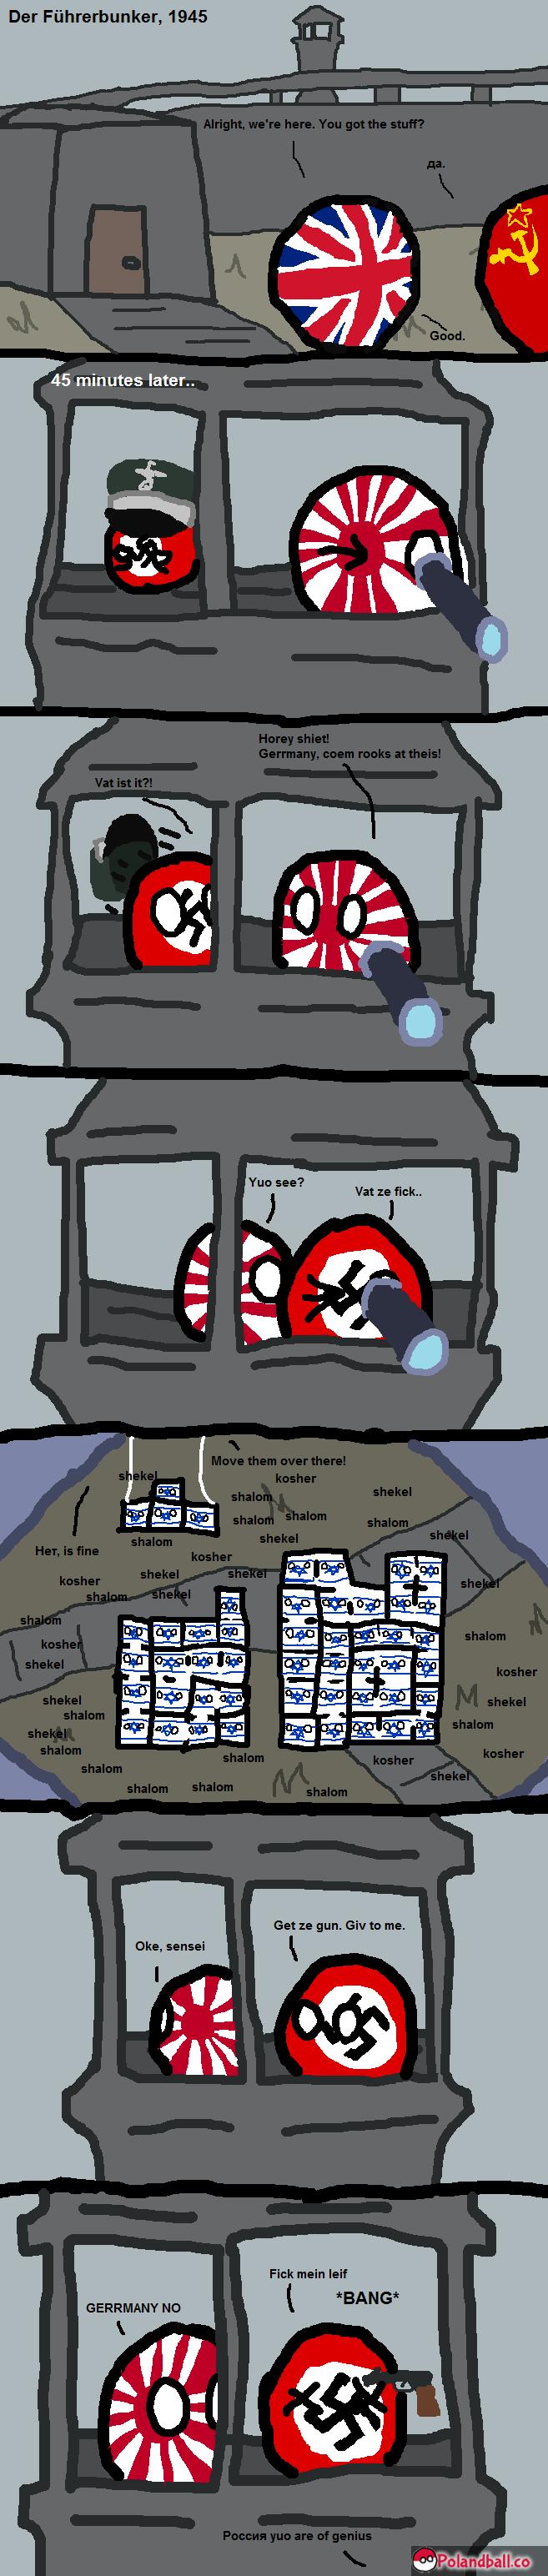 How World War II was really won. Source: . 51 my ; my my Polandball funny